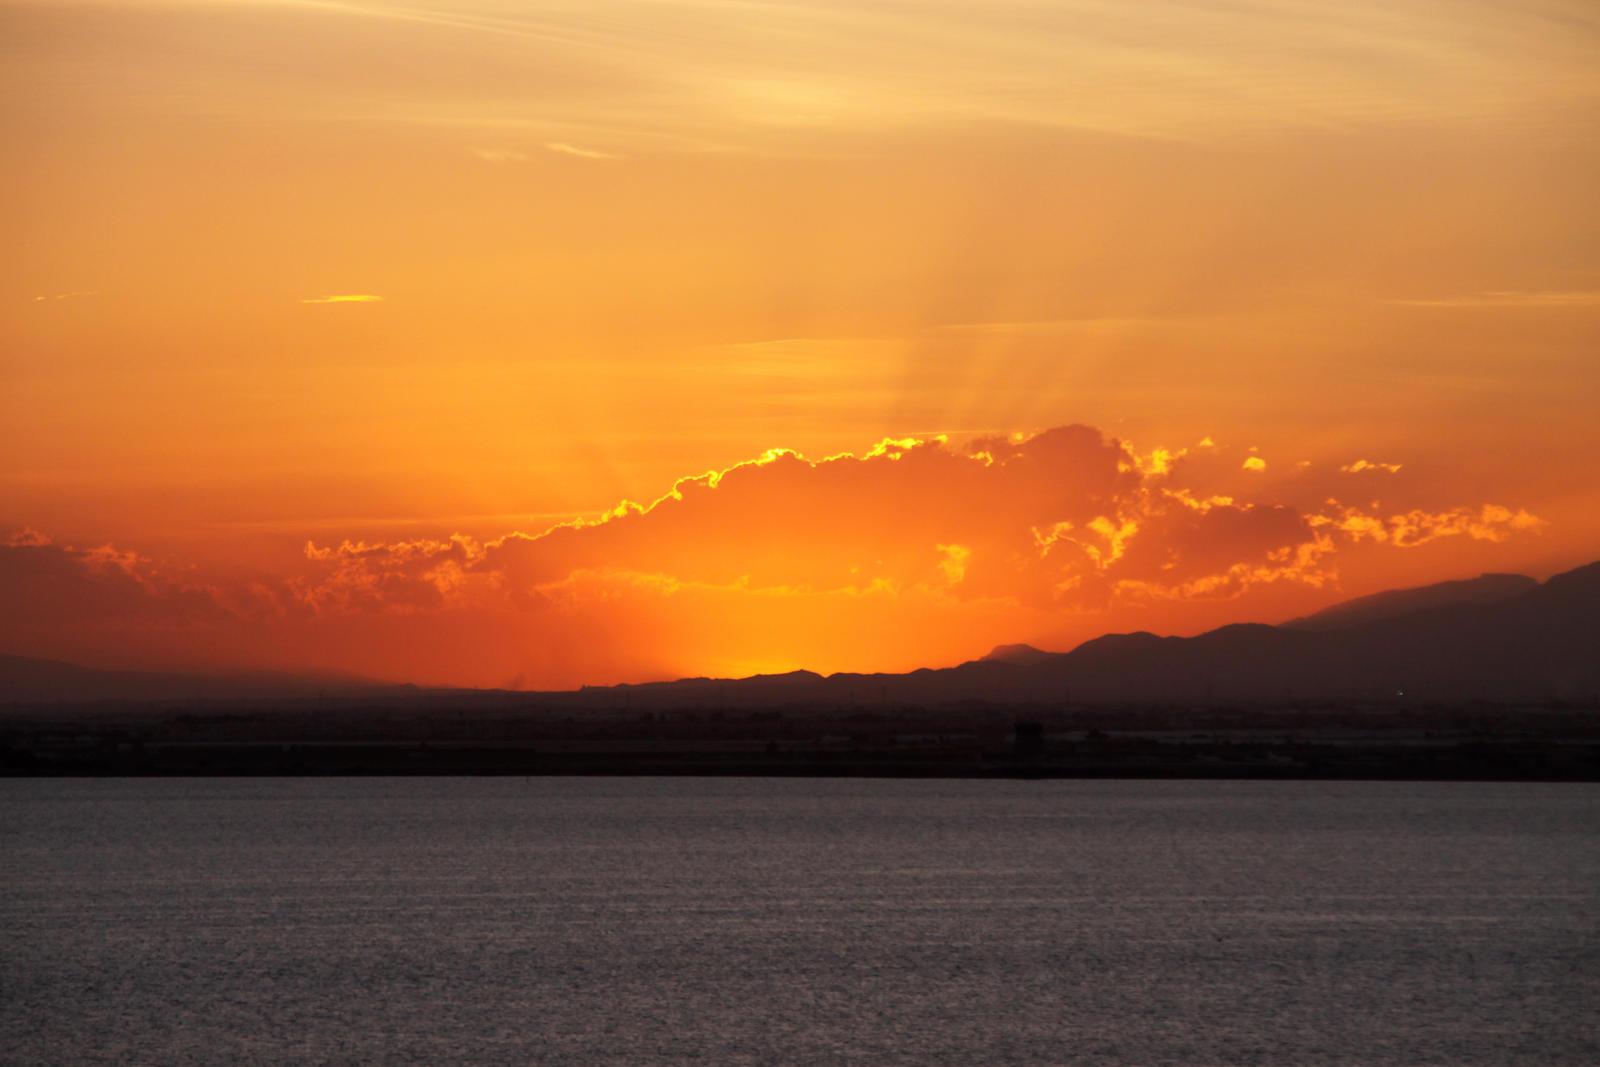 Sunset at La Manga 05 by Datasmurf